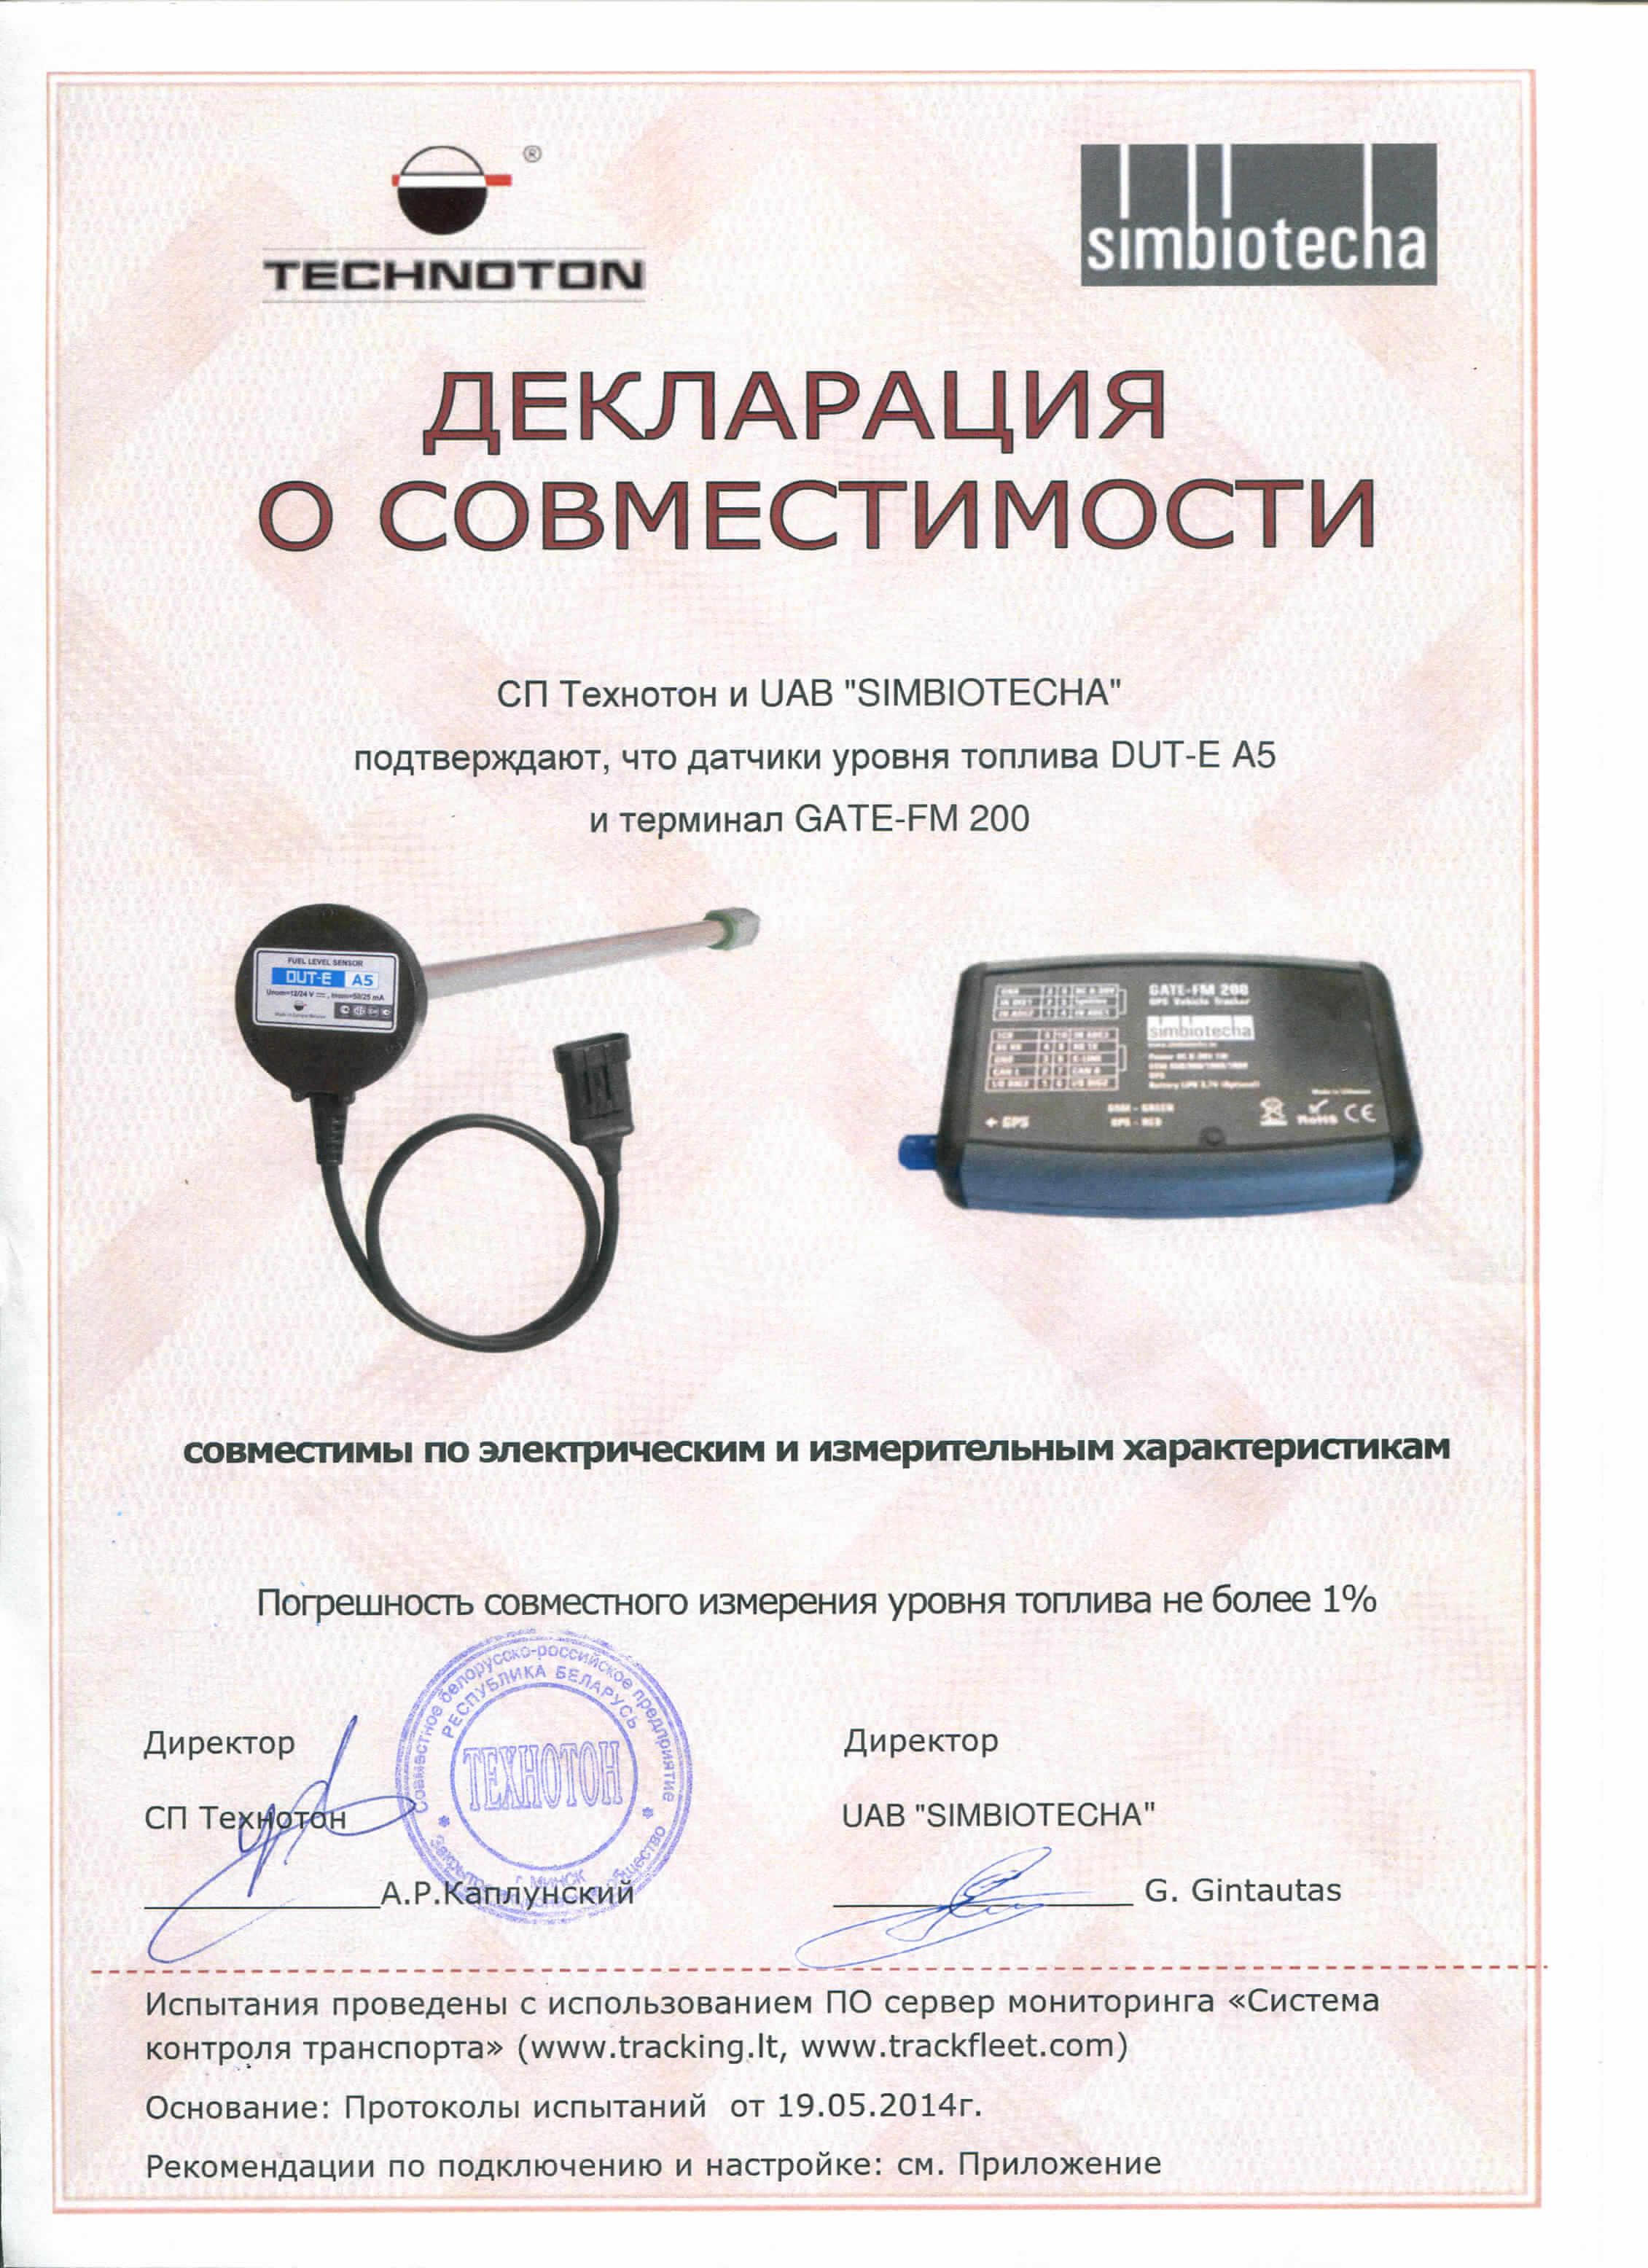 DUT-E-A5 совместим с Simbotecha-GATE-FM-200